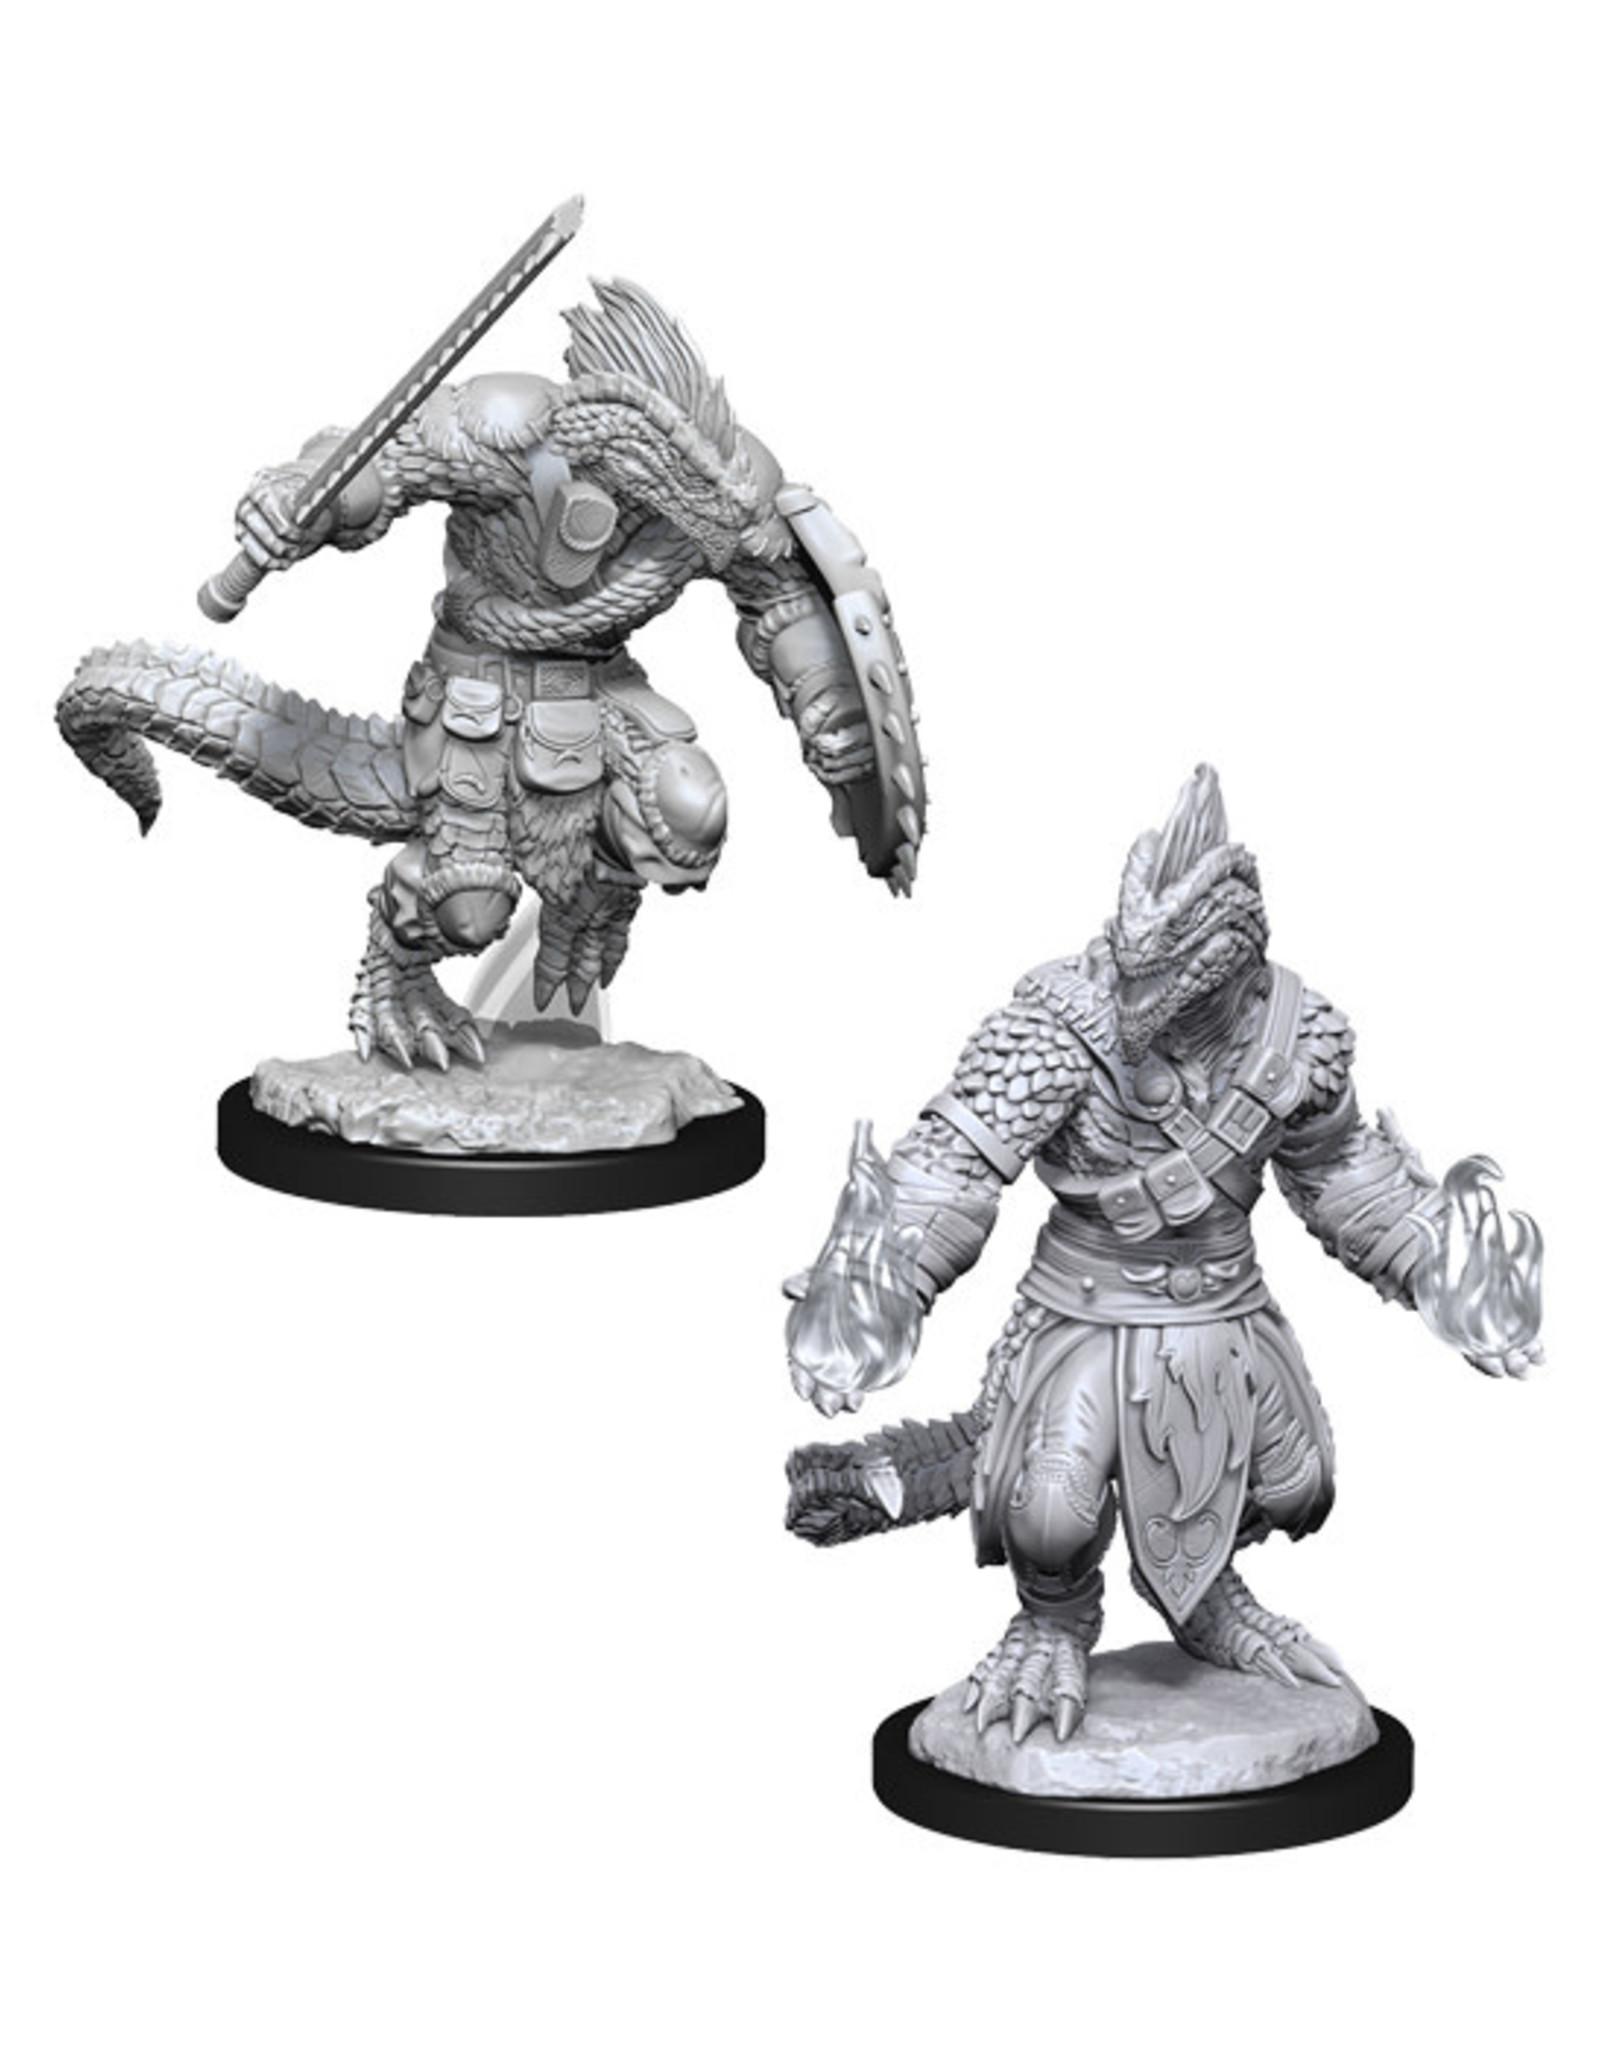 Dungeons & Dragons Dungeons & Dragons: Nolzur's - Lizardfolk Barbarian & Lizardfolk Cleric